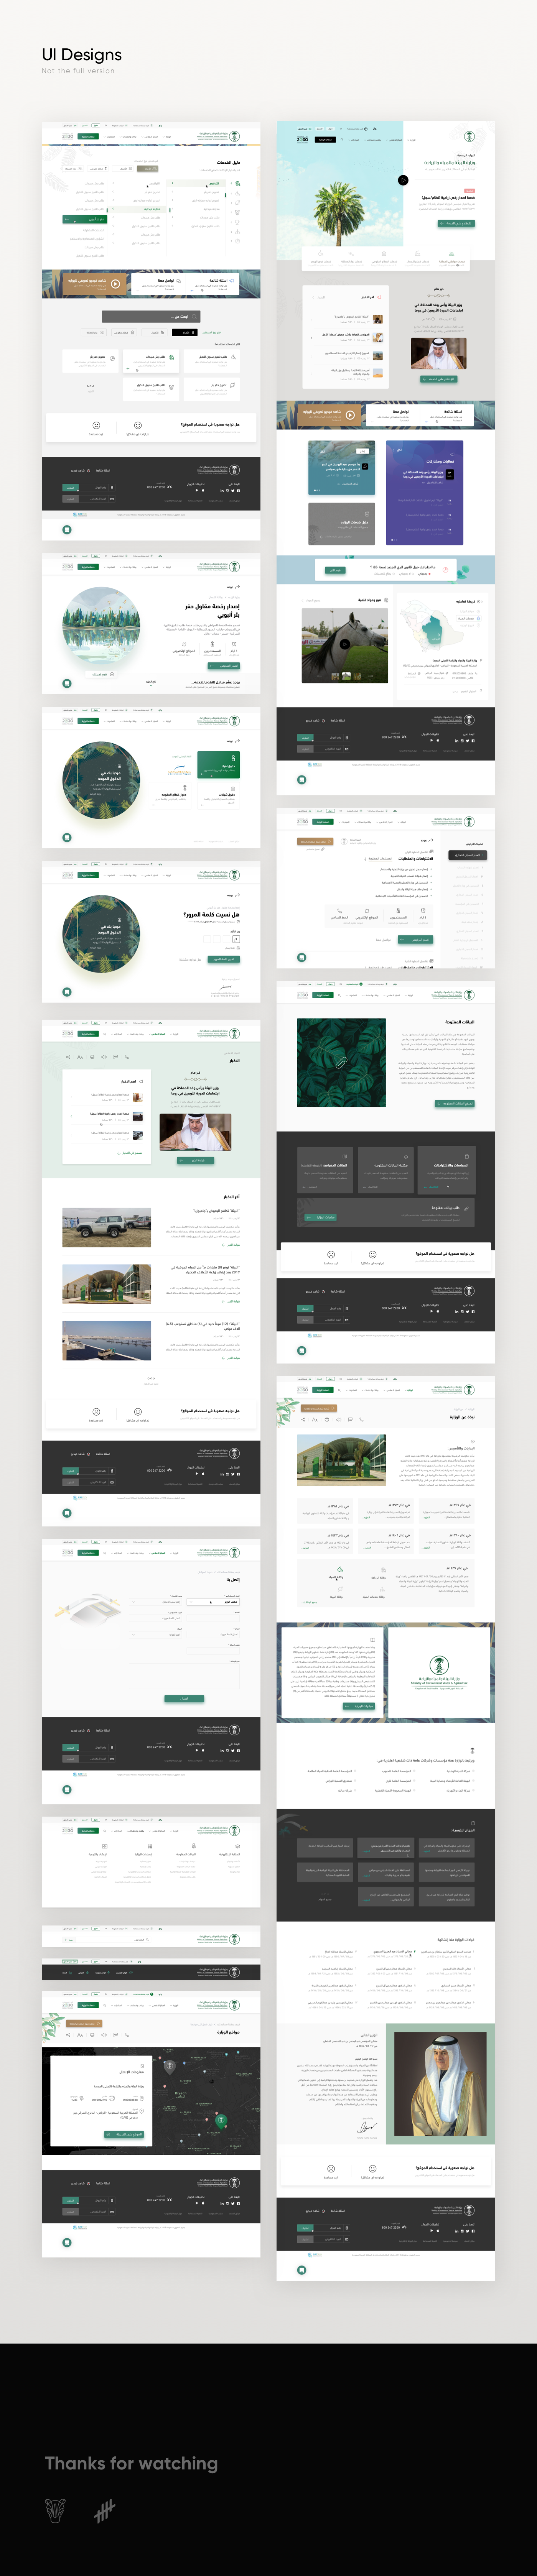 design,Ministry,govenmental,official,ux,UI,KSA